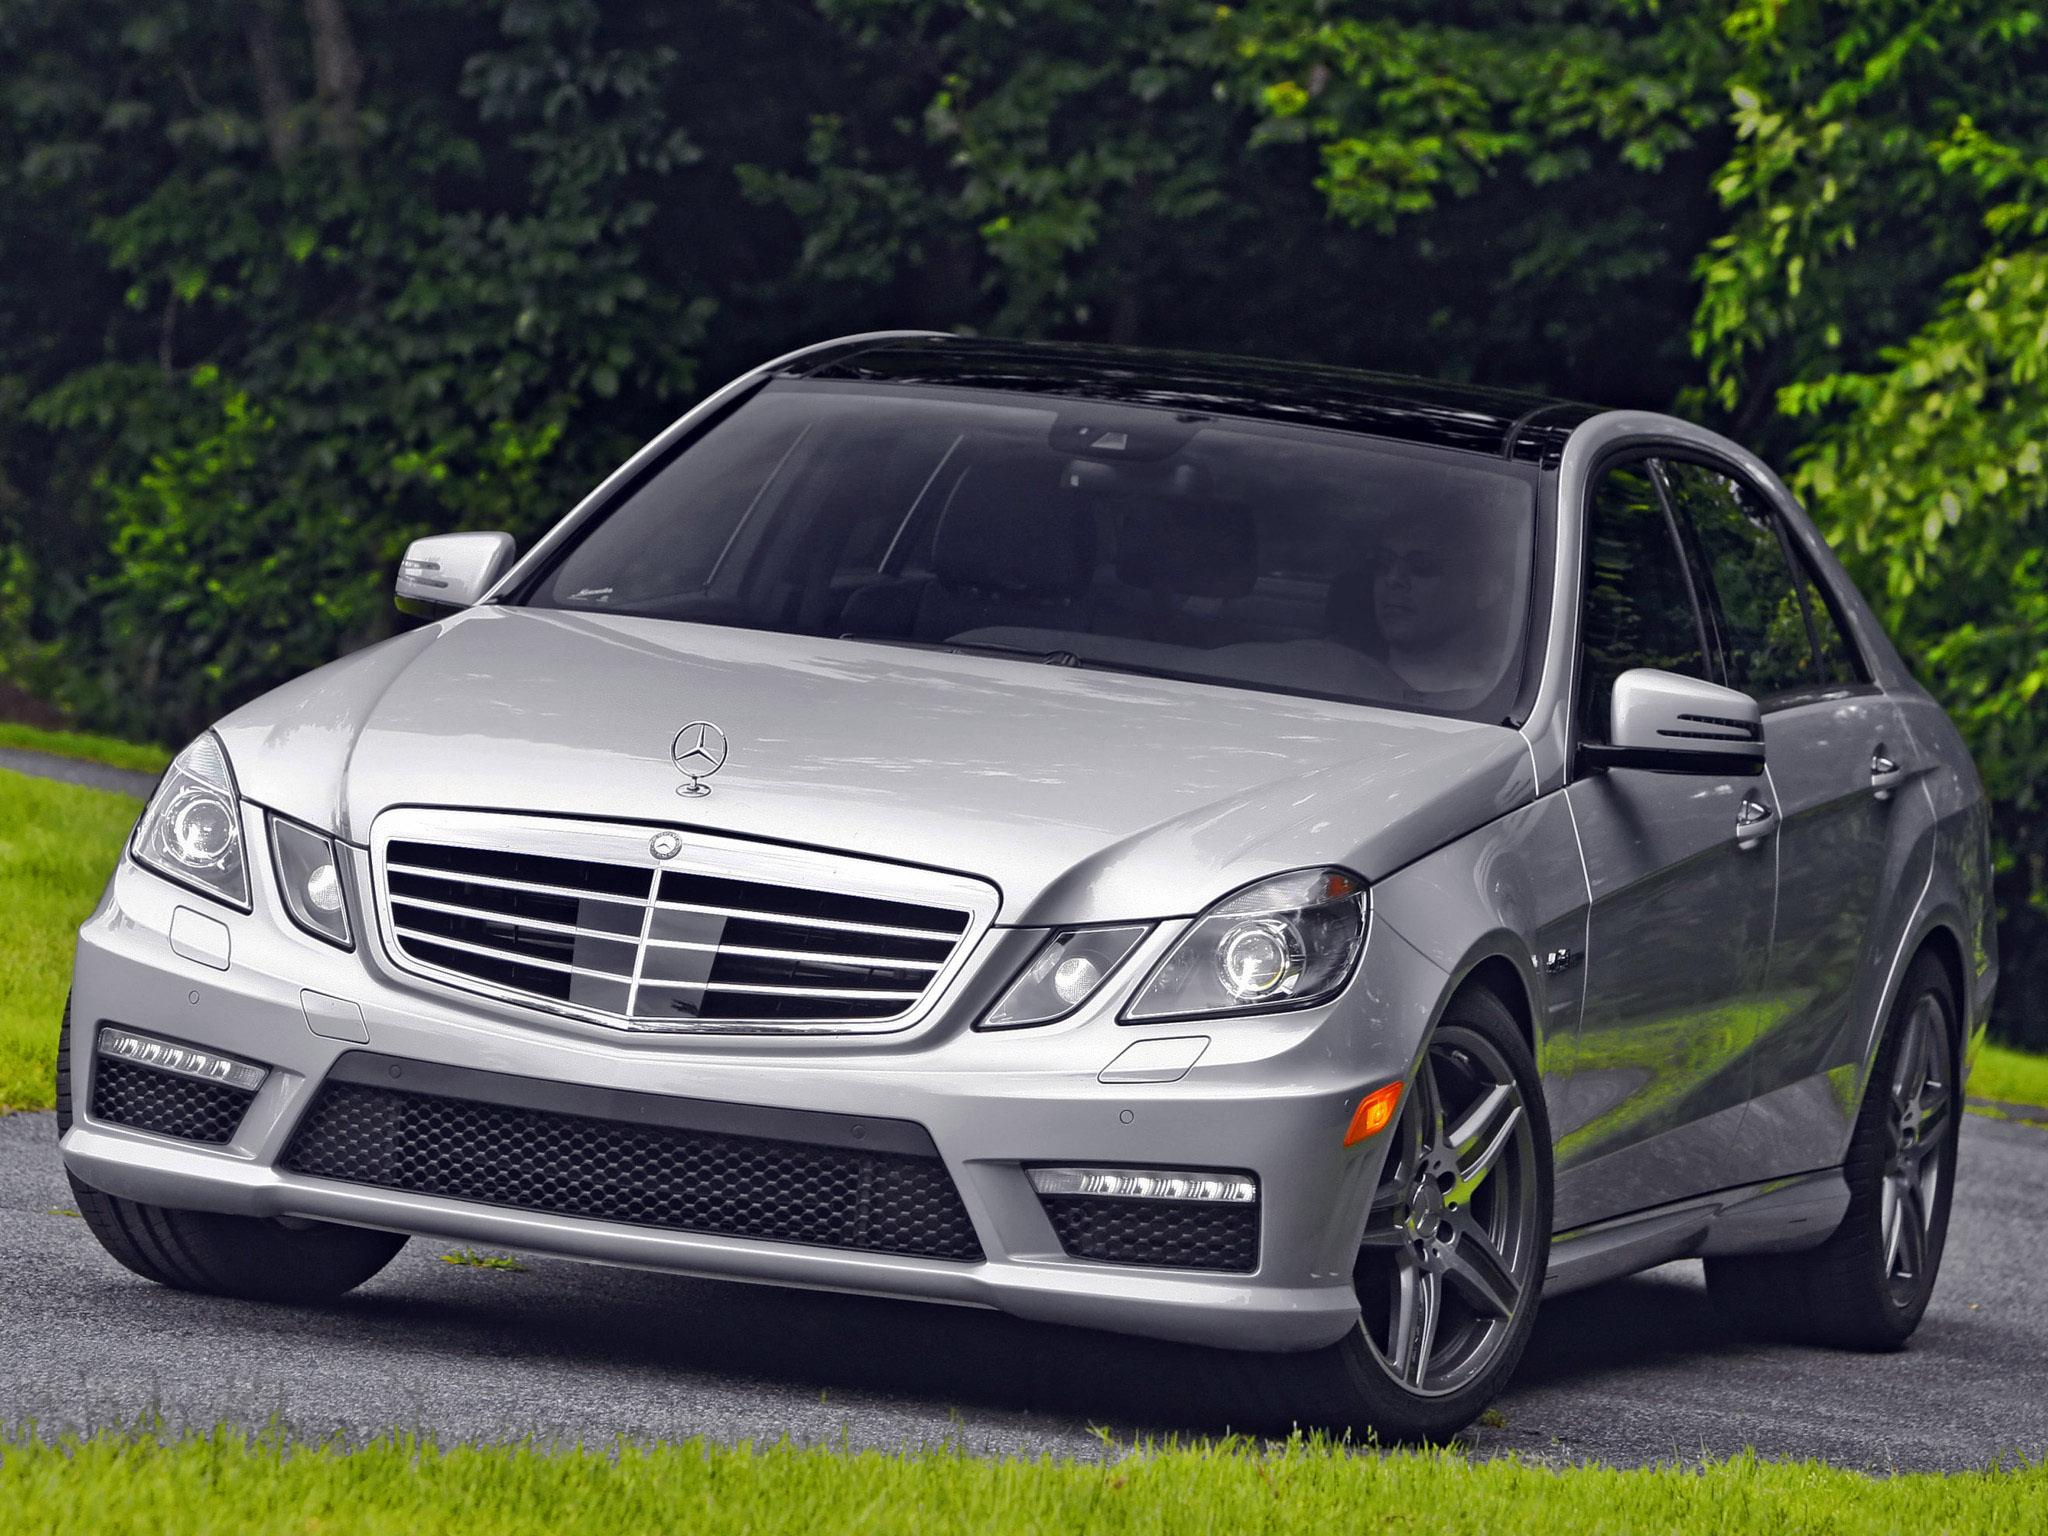 Amg Mercedes E Klasse E63 Usa W212 2009 Amg Mercedes E Klasse E63 Usa W212 2009 Photo 04 Car